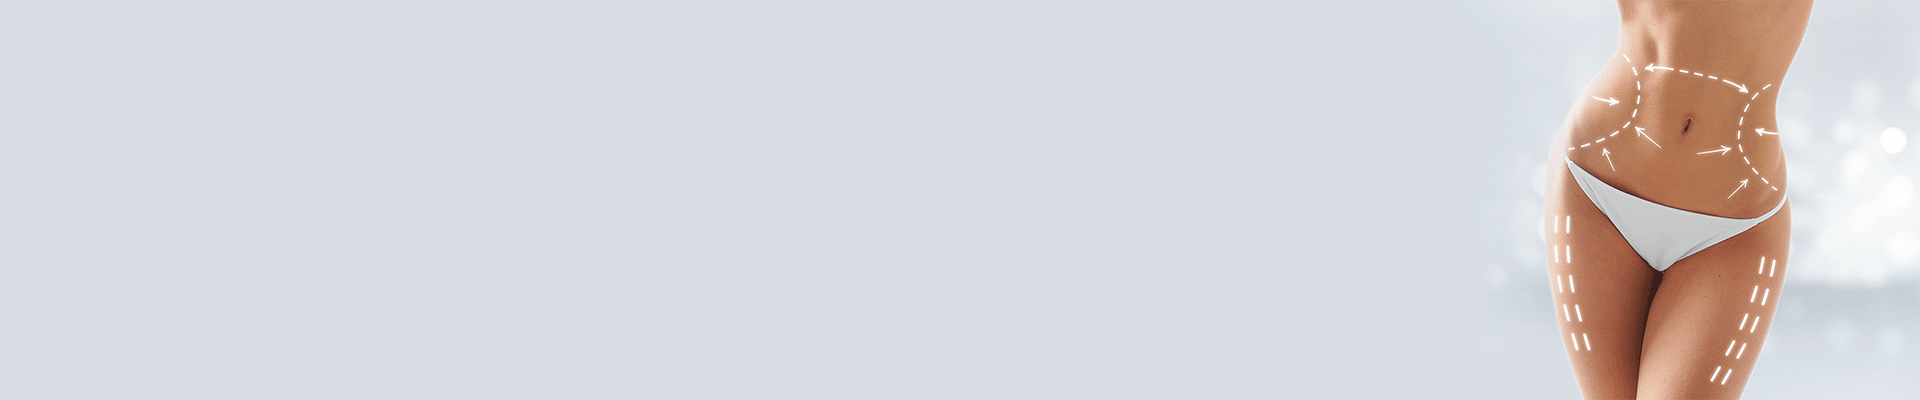 [:fr]Liposuccion Nabeul : Prix lipostructure, lipoaspiration complète pas cher[:ar]شفط الدهون في نابل، تنسيق القوام عبر الشفط، إزالة الدهون بالكامل[:]